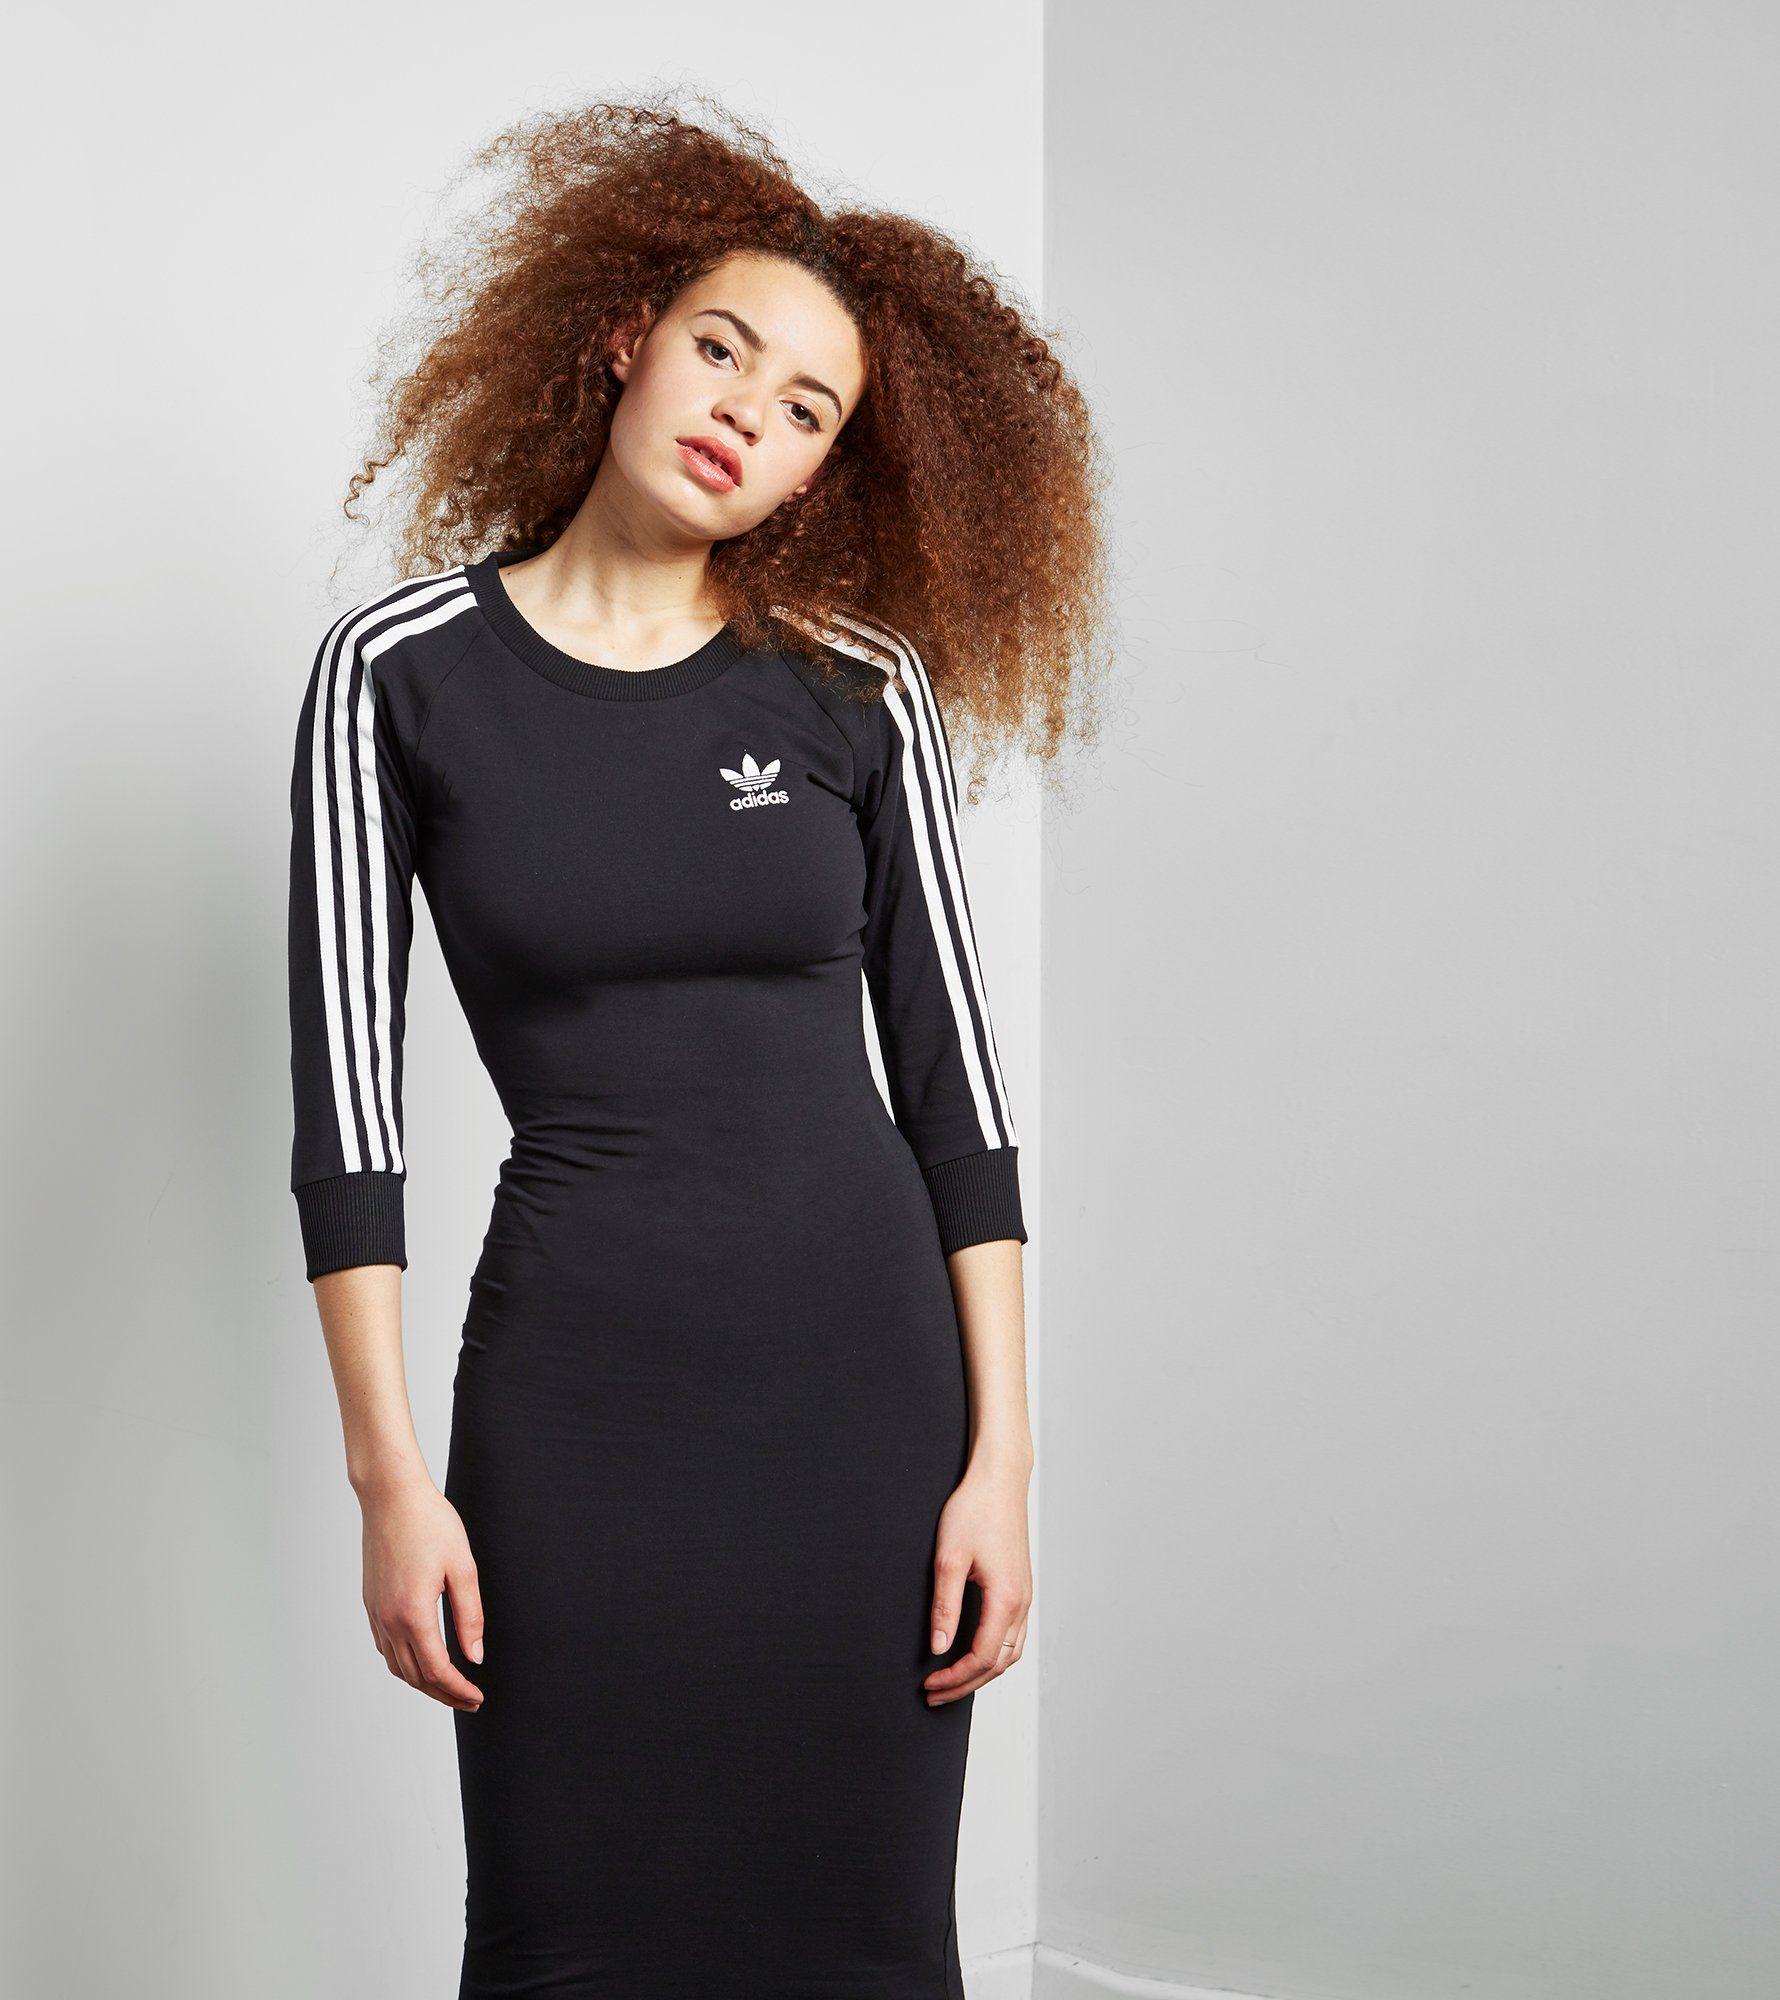 adidas Originals Three Stripes Dress